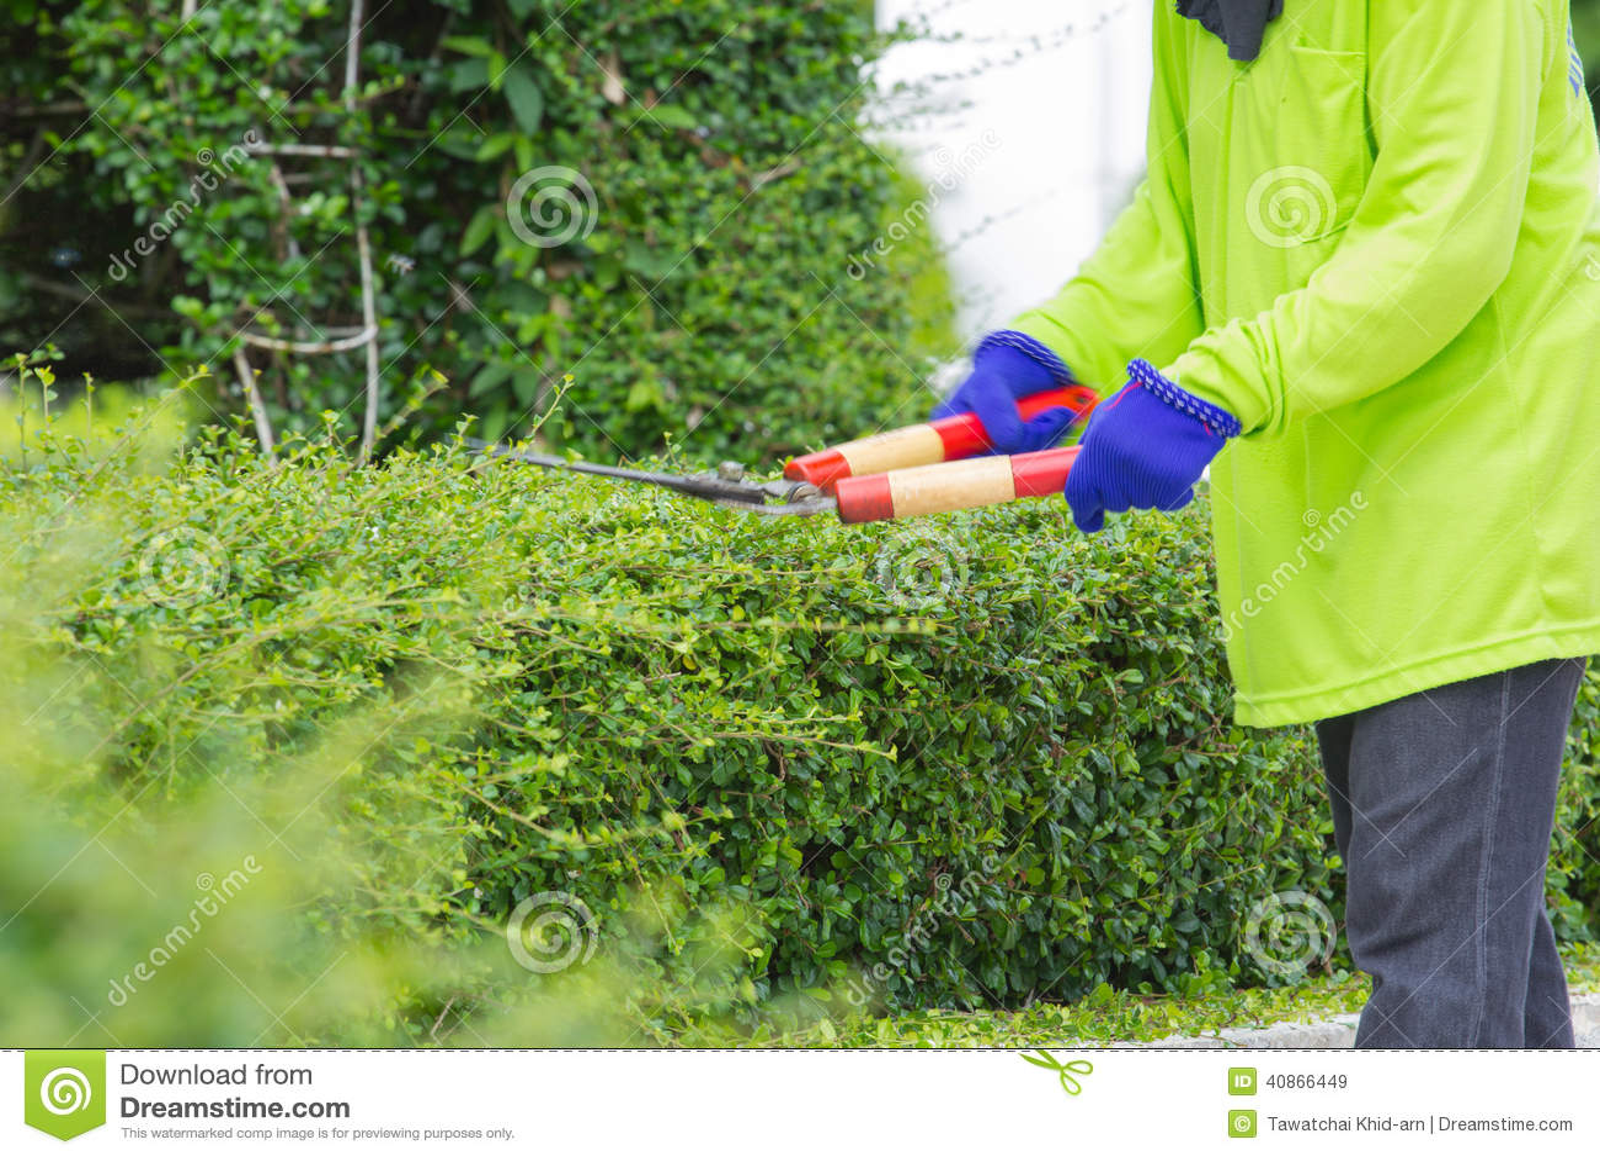 Blurred image of a man cutting green bush (motion blur image)